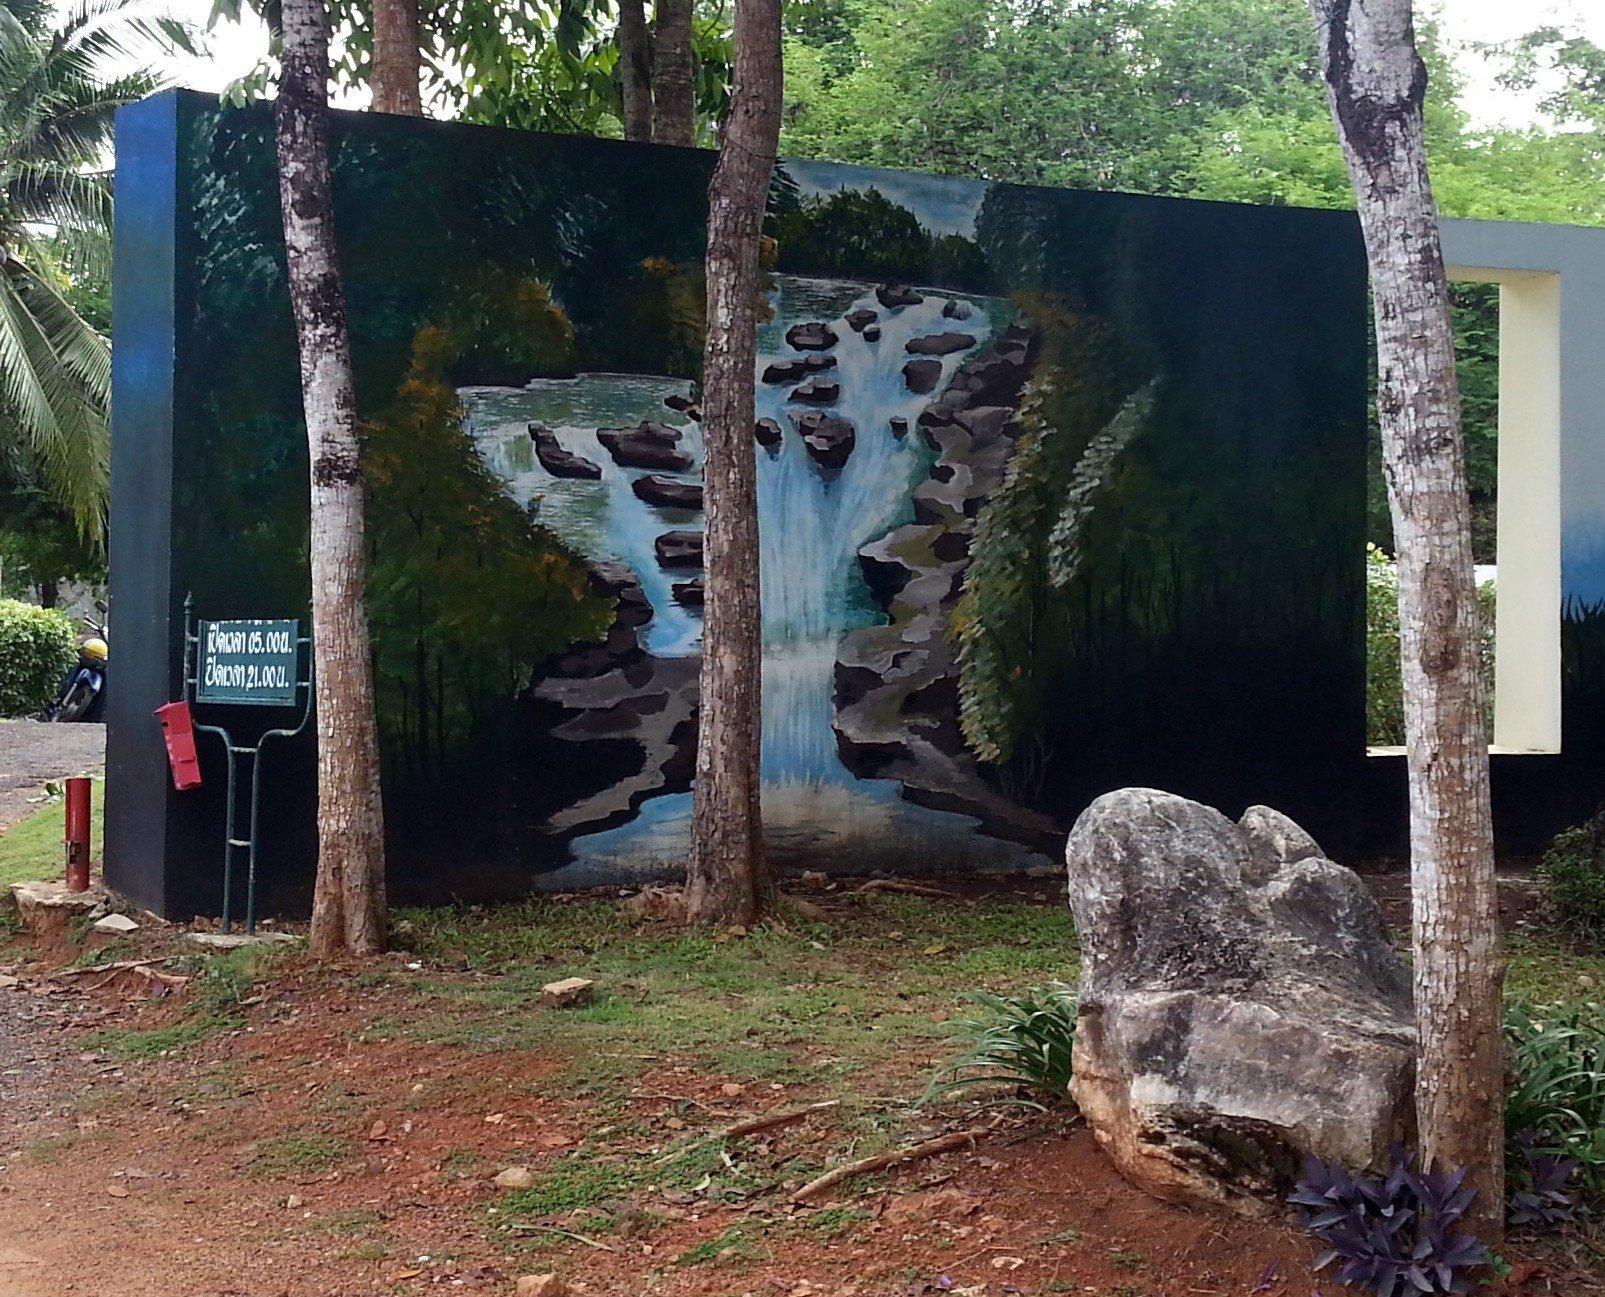 Mural of Ton Te Waterfall in Trang Province